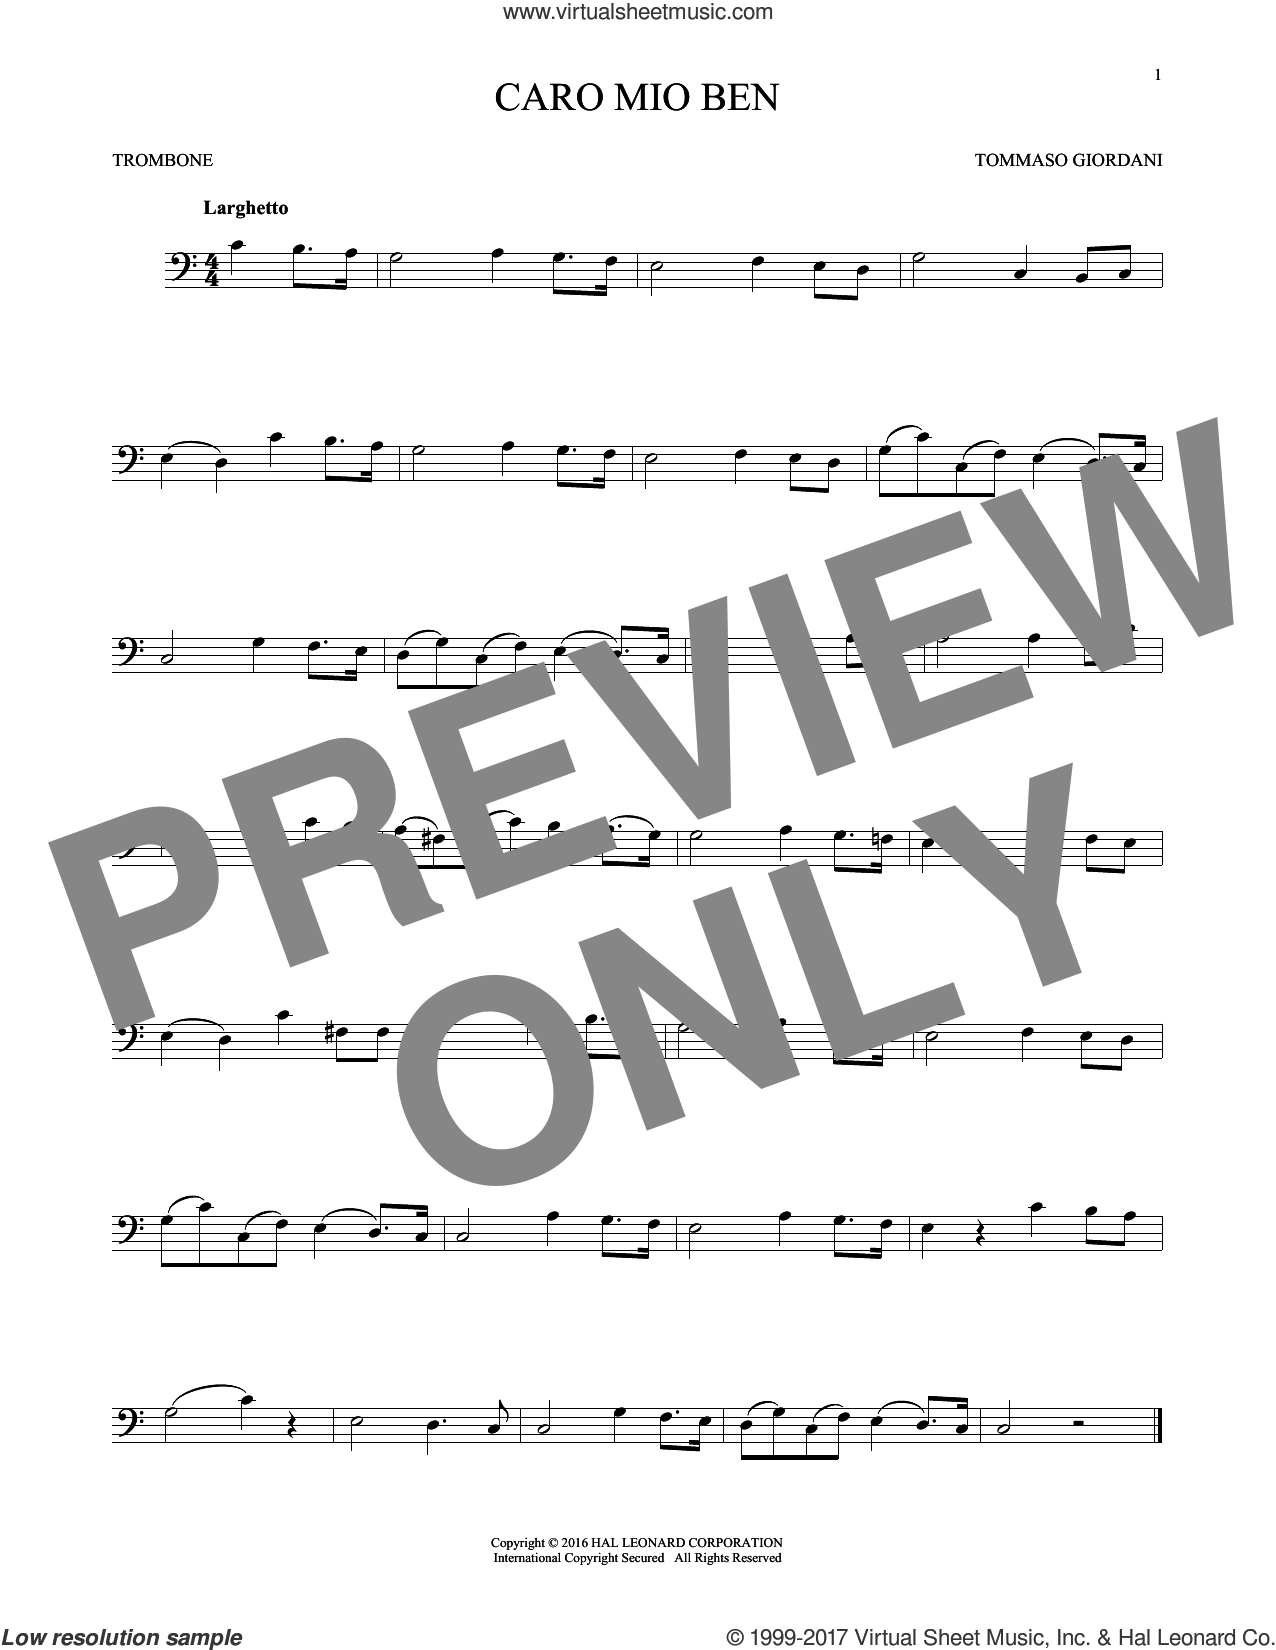 Caro Mio Ben sheet music for trombone solo by Tommaso Giordani and Anonymous Italian poem, classical score, intermediate skill level